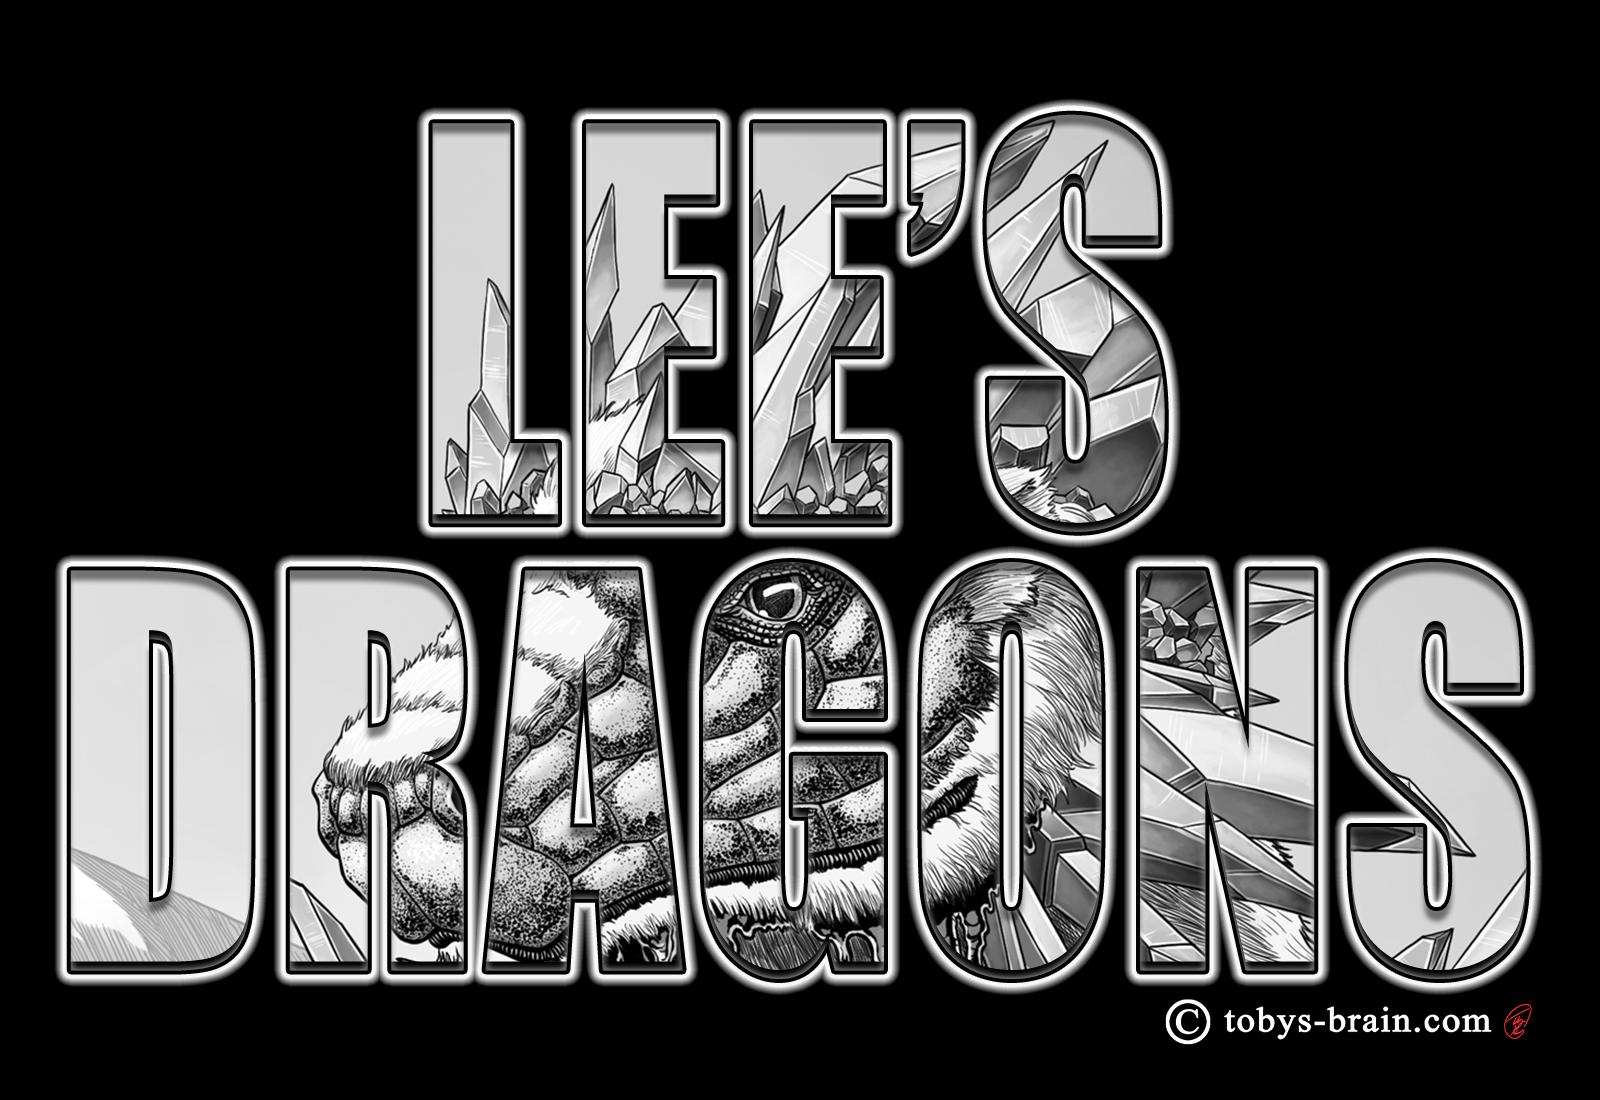 Lee's Dragons: Arctic Dragon